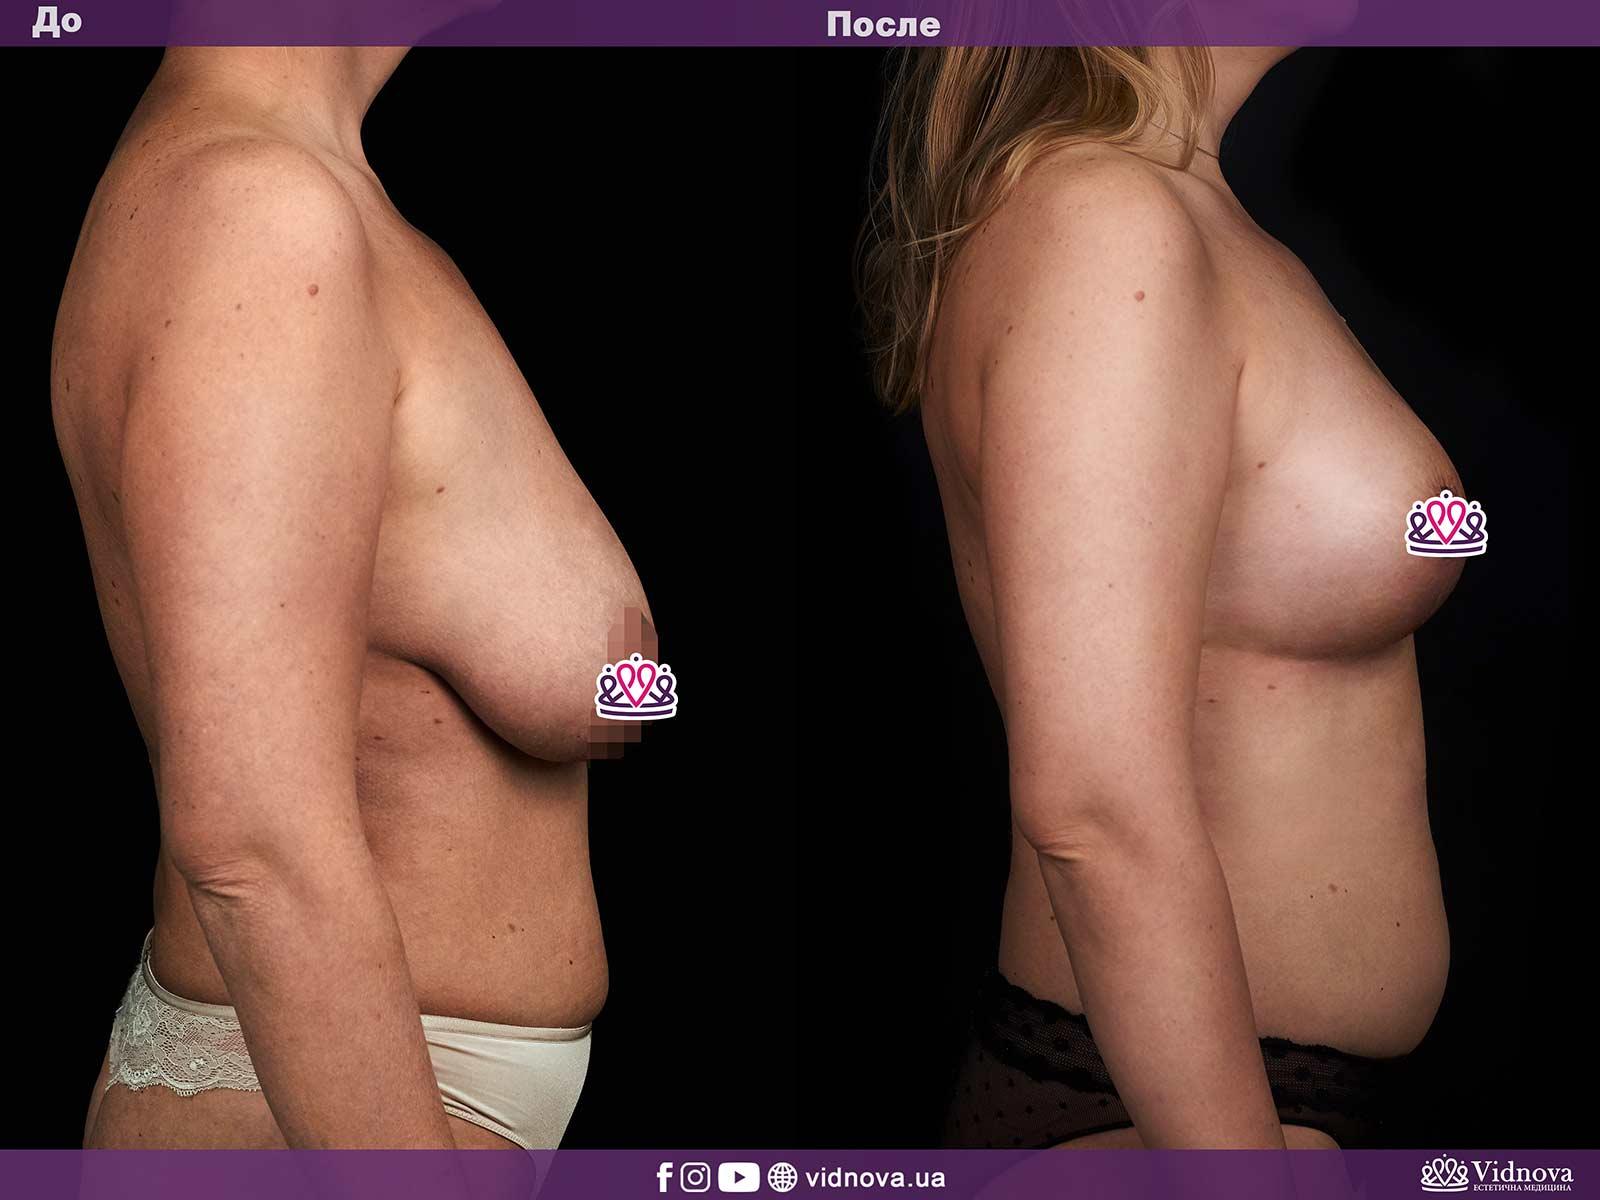 Подтяжка груди: Фото ДО и ПОСЛЕ - Пример №4-3 - Клиника Vidnova